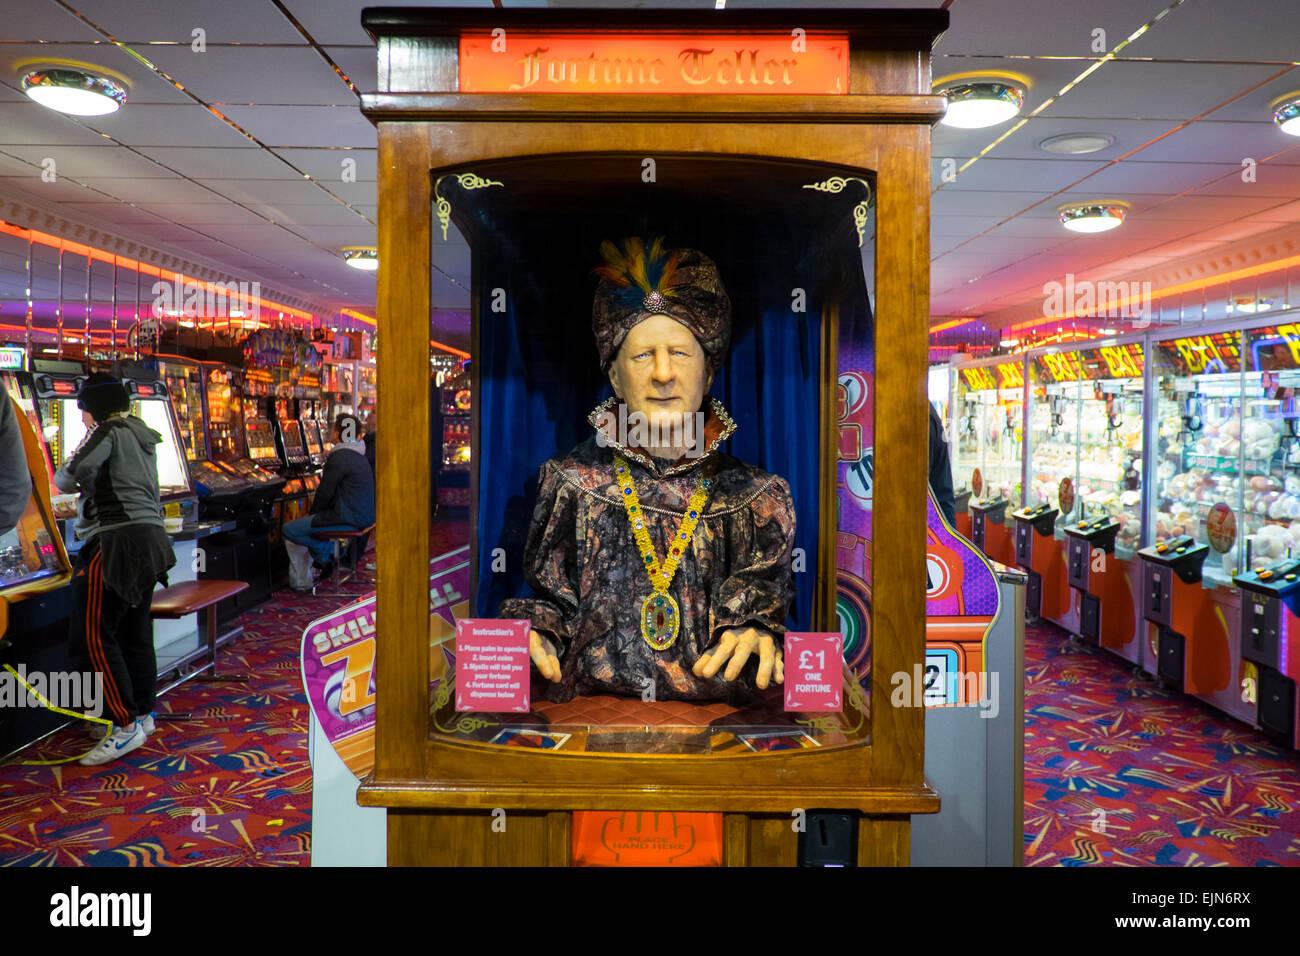 Fortune telling machine in a Llandudno amusement arcade, Conwy,Wales. UK - Stock Image